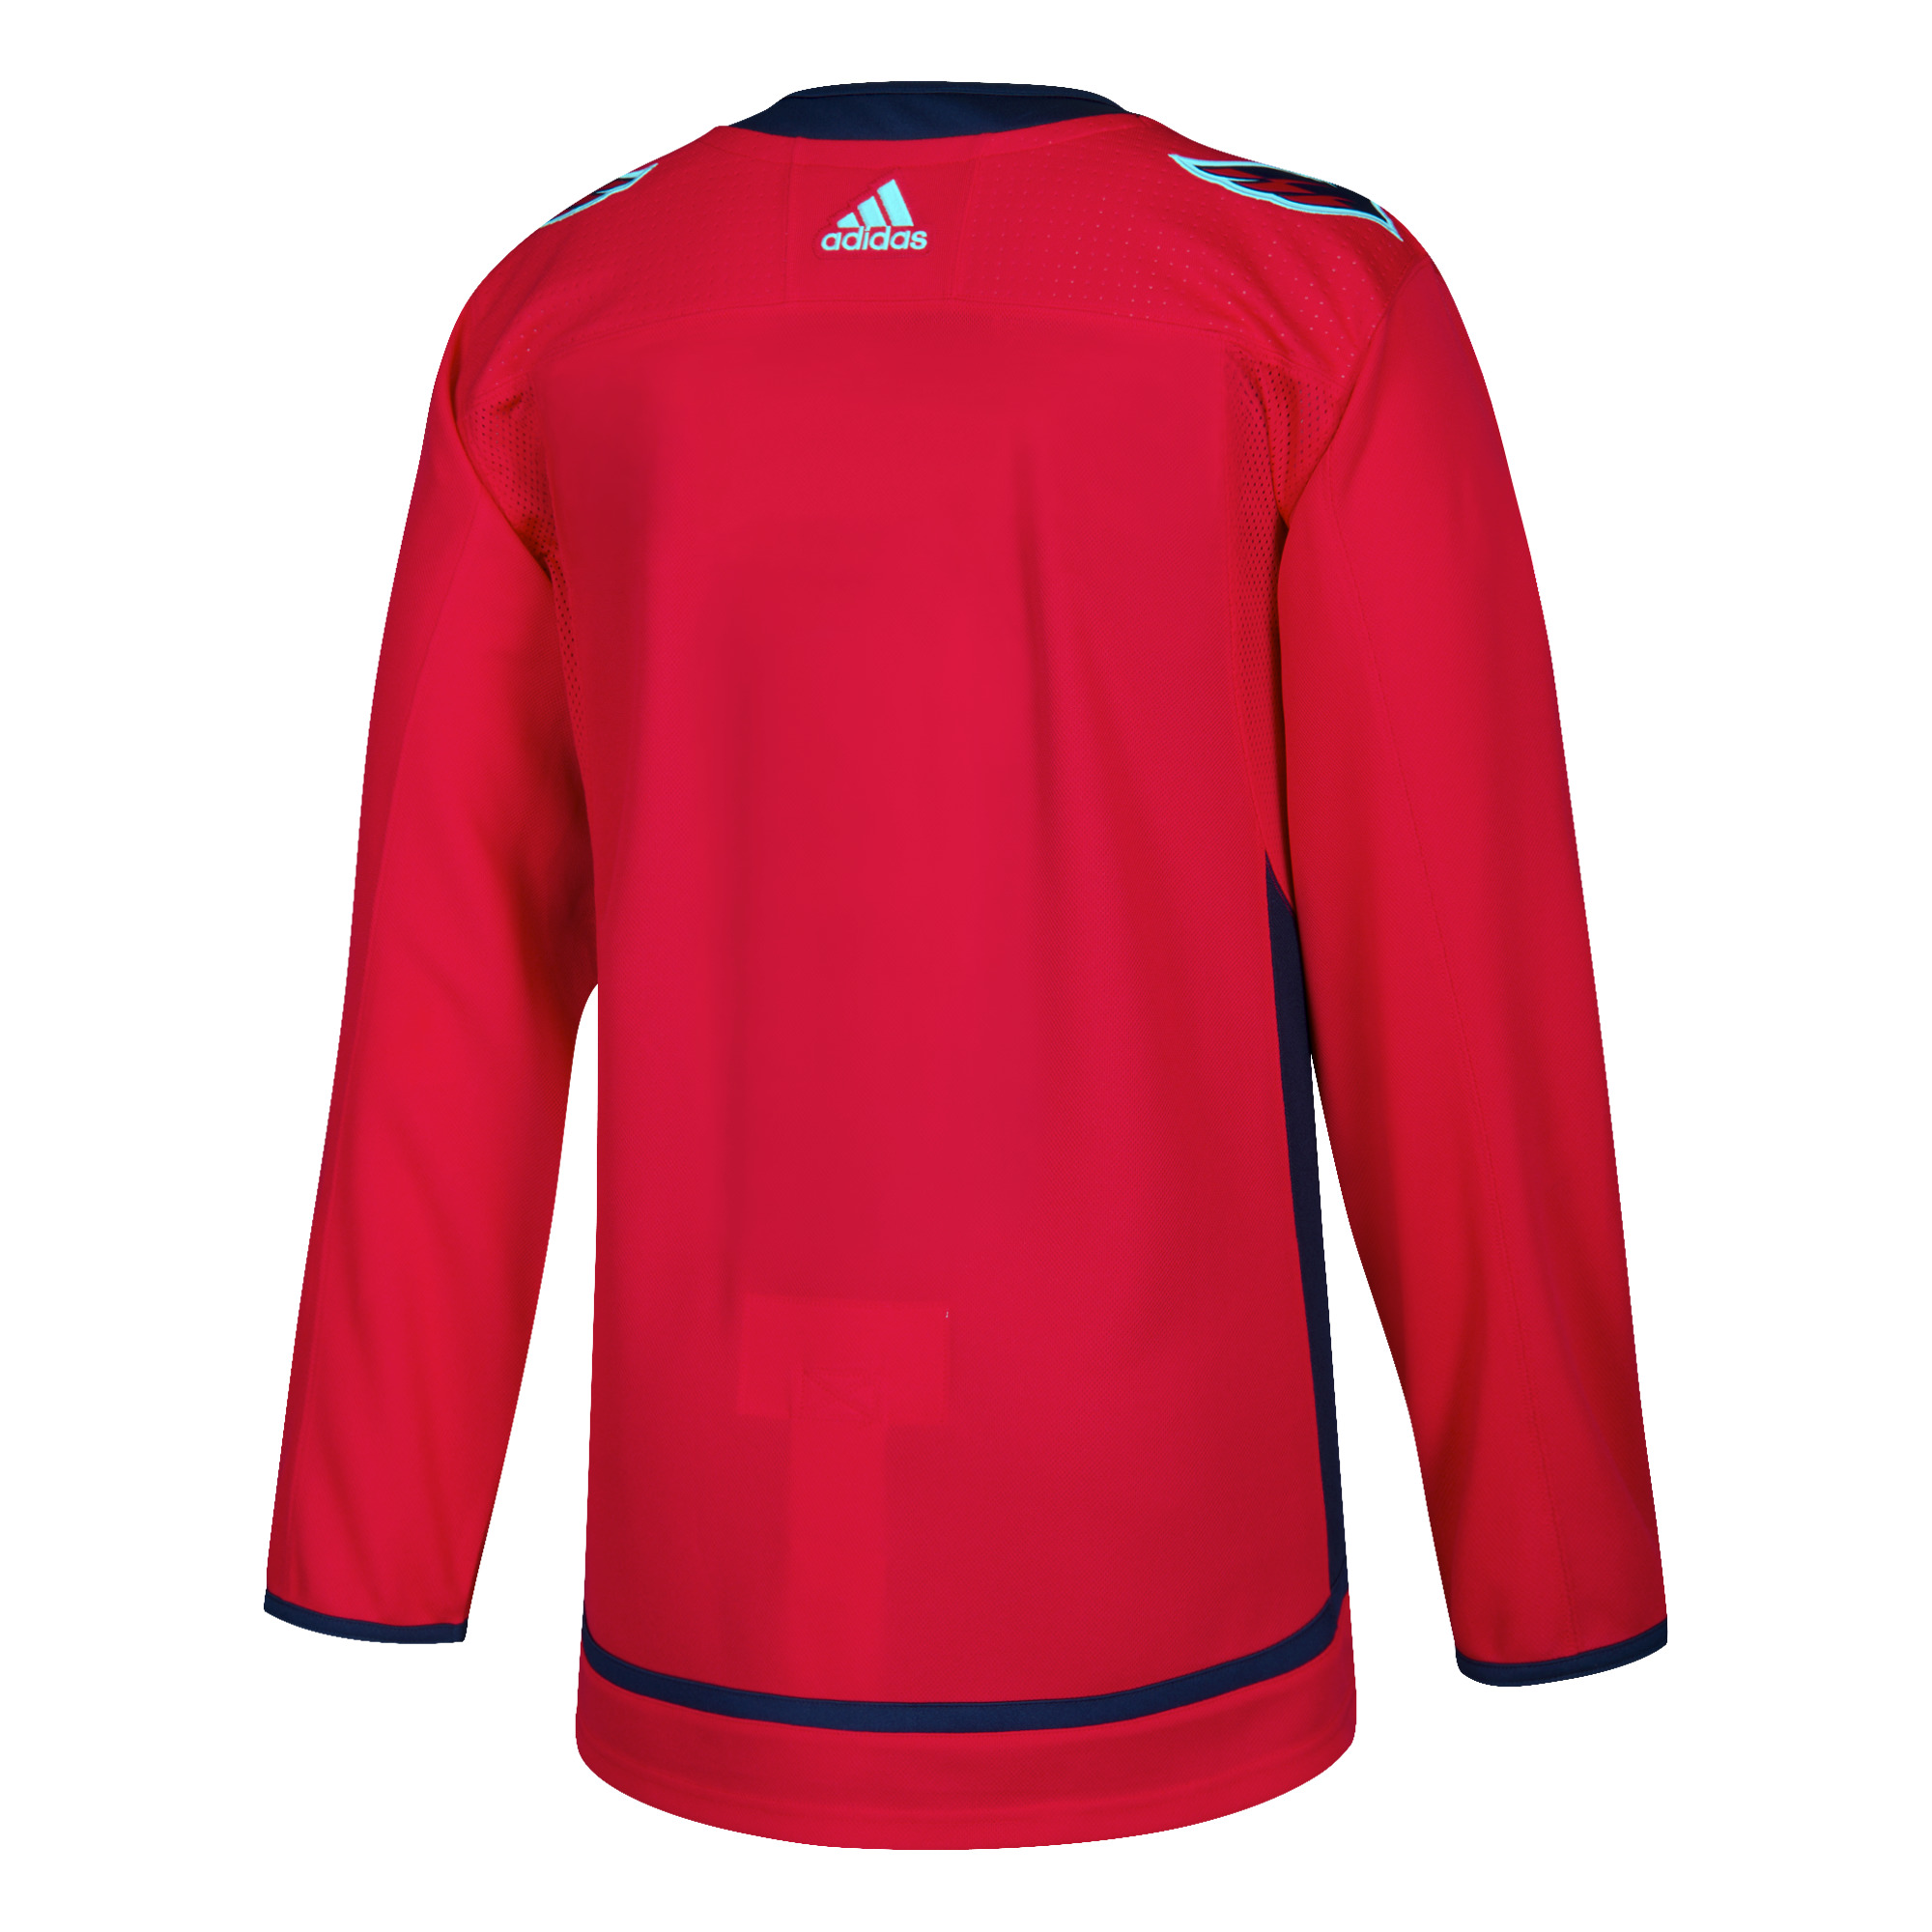 f40c5f0d7 Washington Capitals Adidas NHL Men s Climalite Authentic Team Hockey Jersey  - Walmart.com